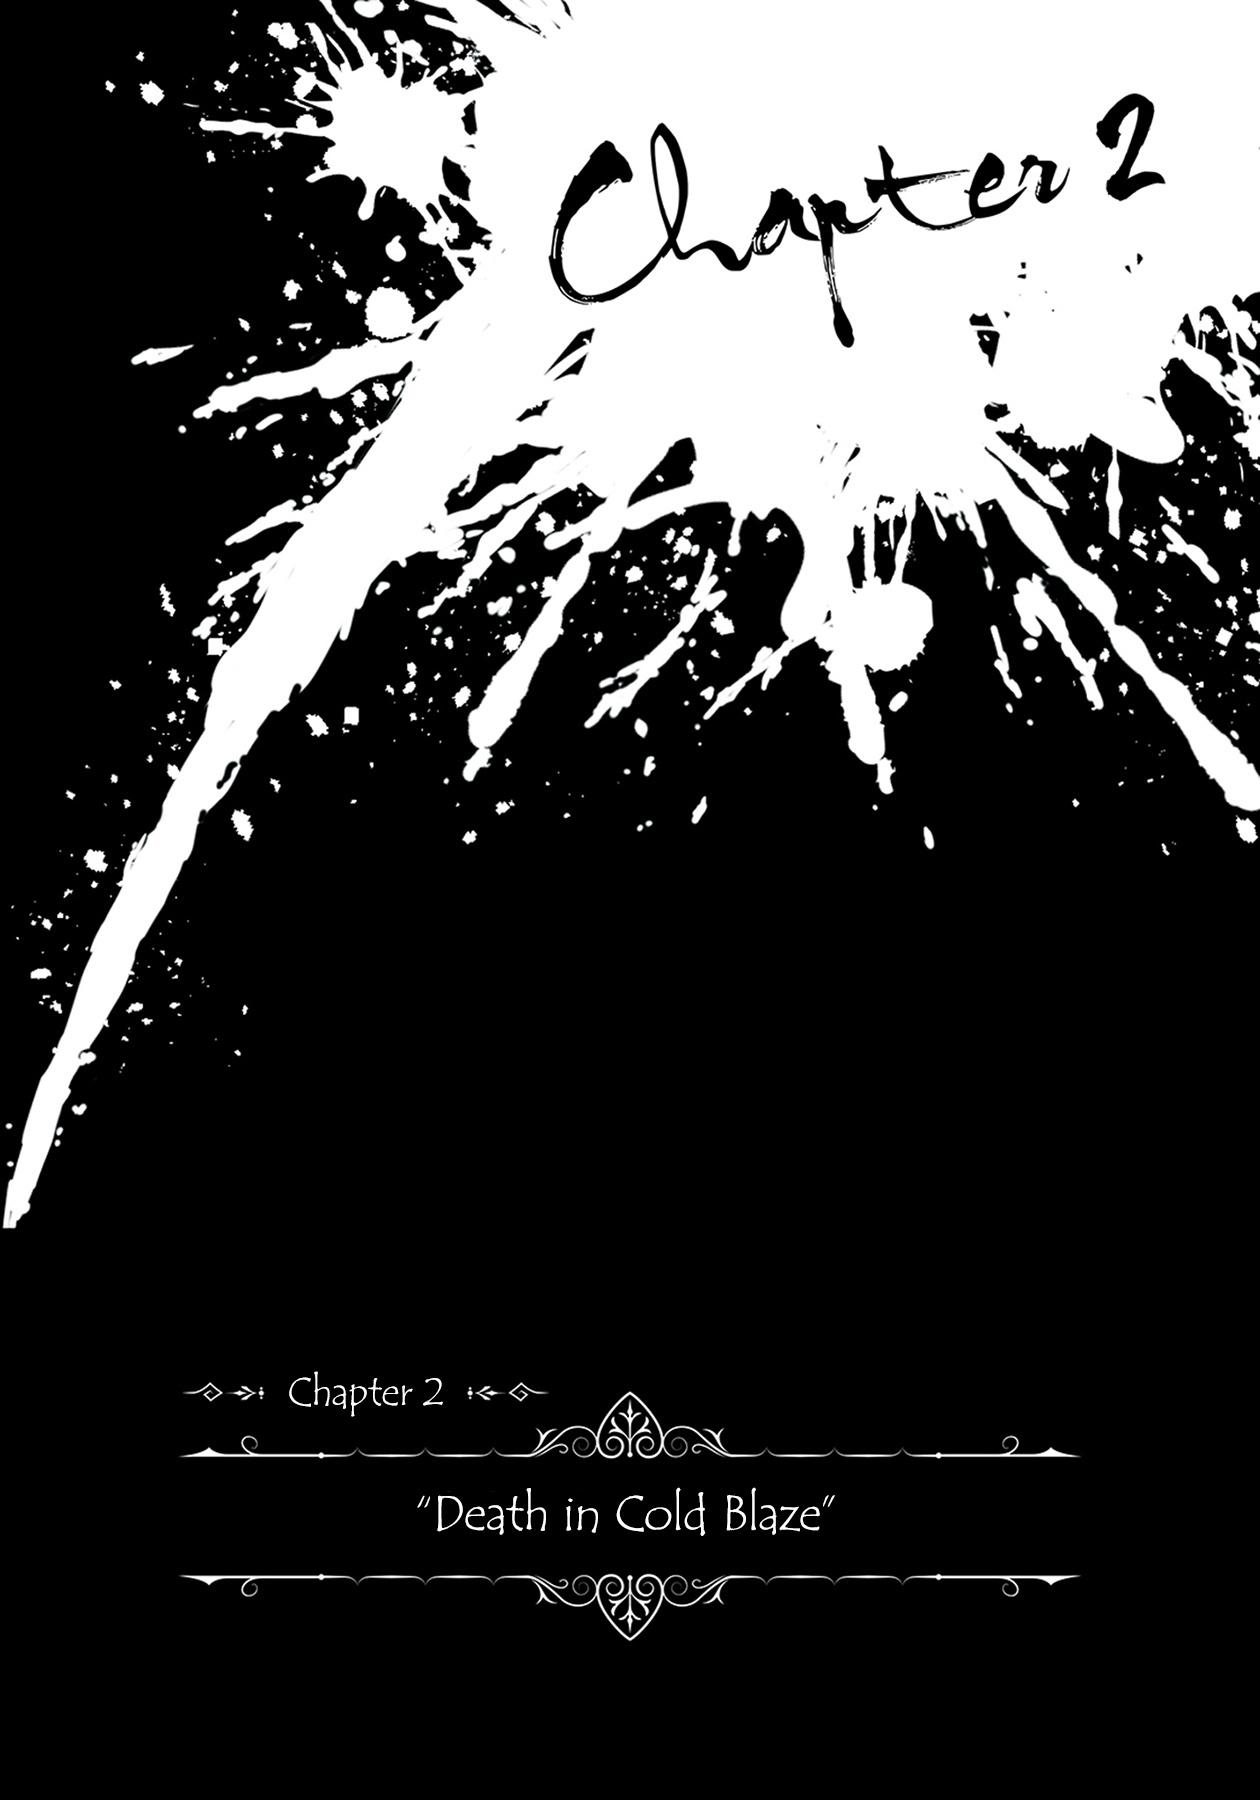 Elvenblood - Vol 1 Chapter 2